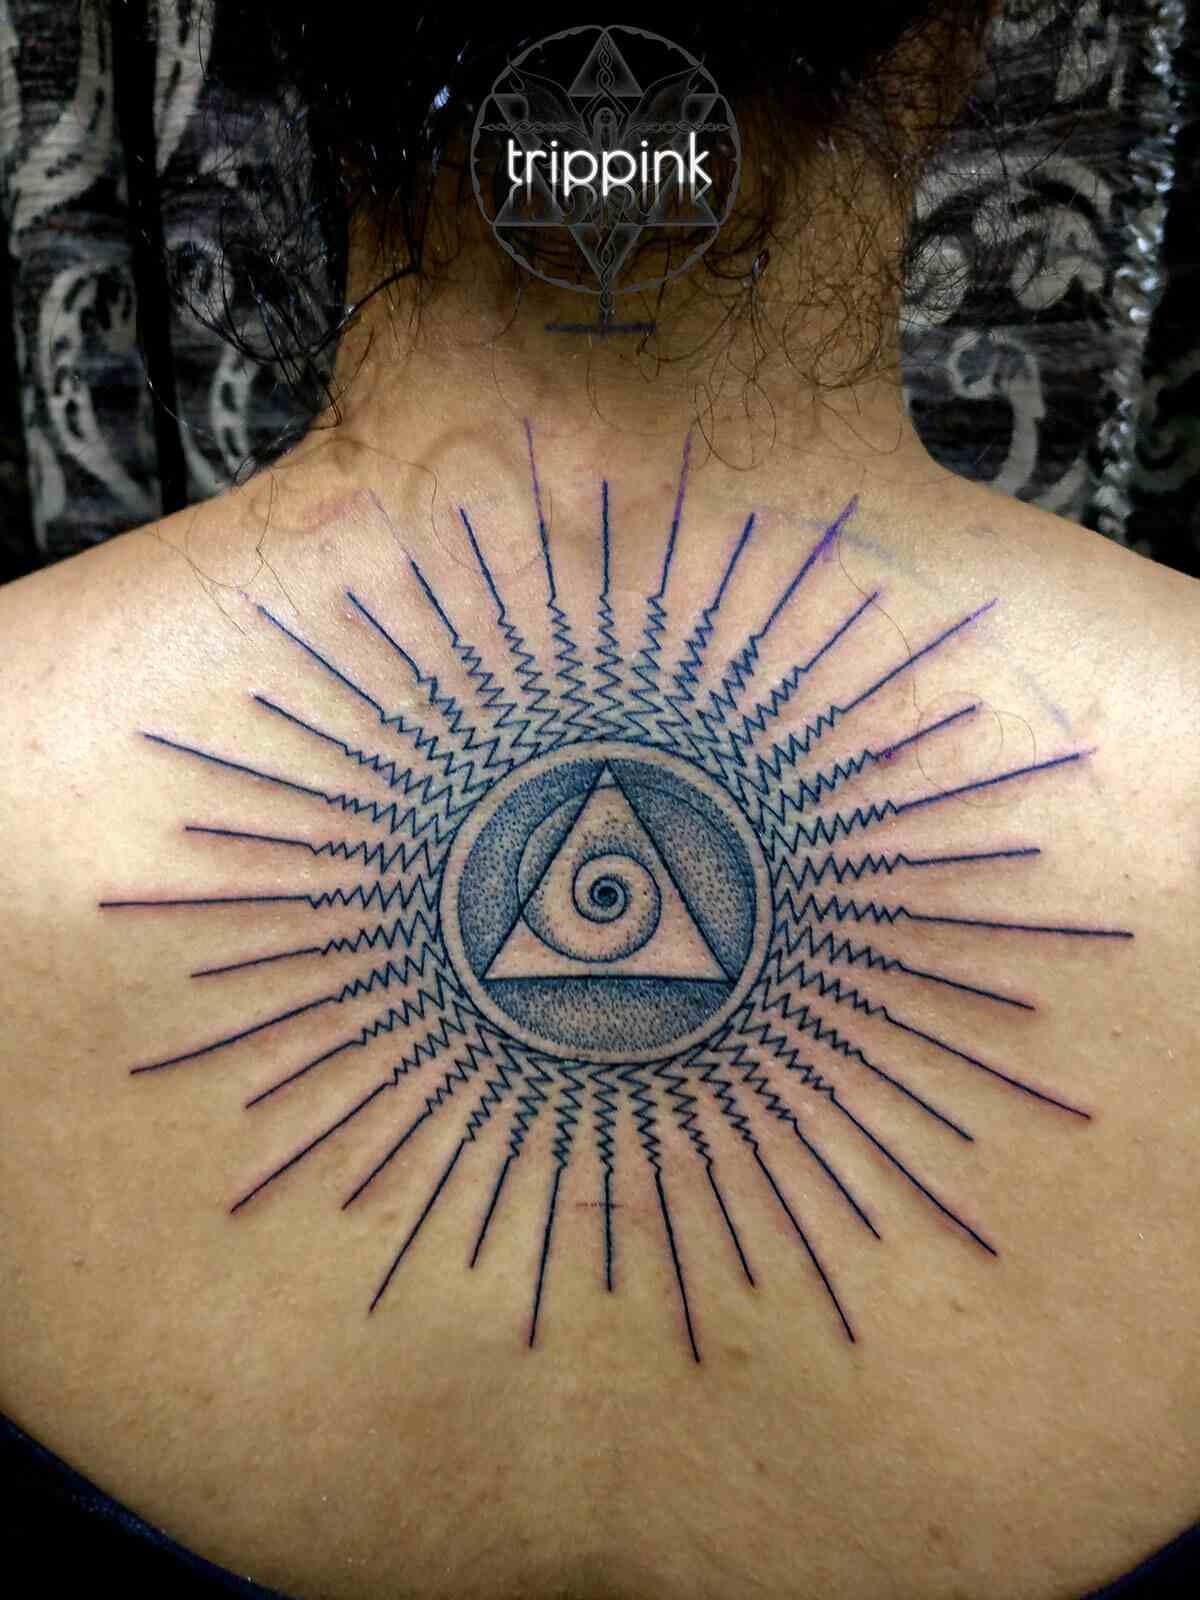 trippink-tattoo-bangalore-abstract-back-tattoo